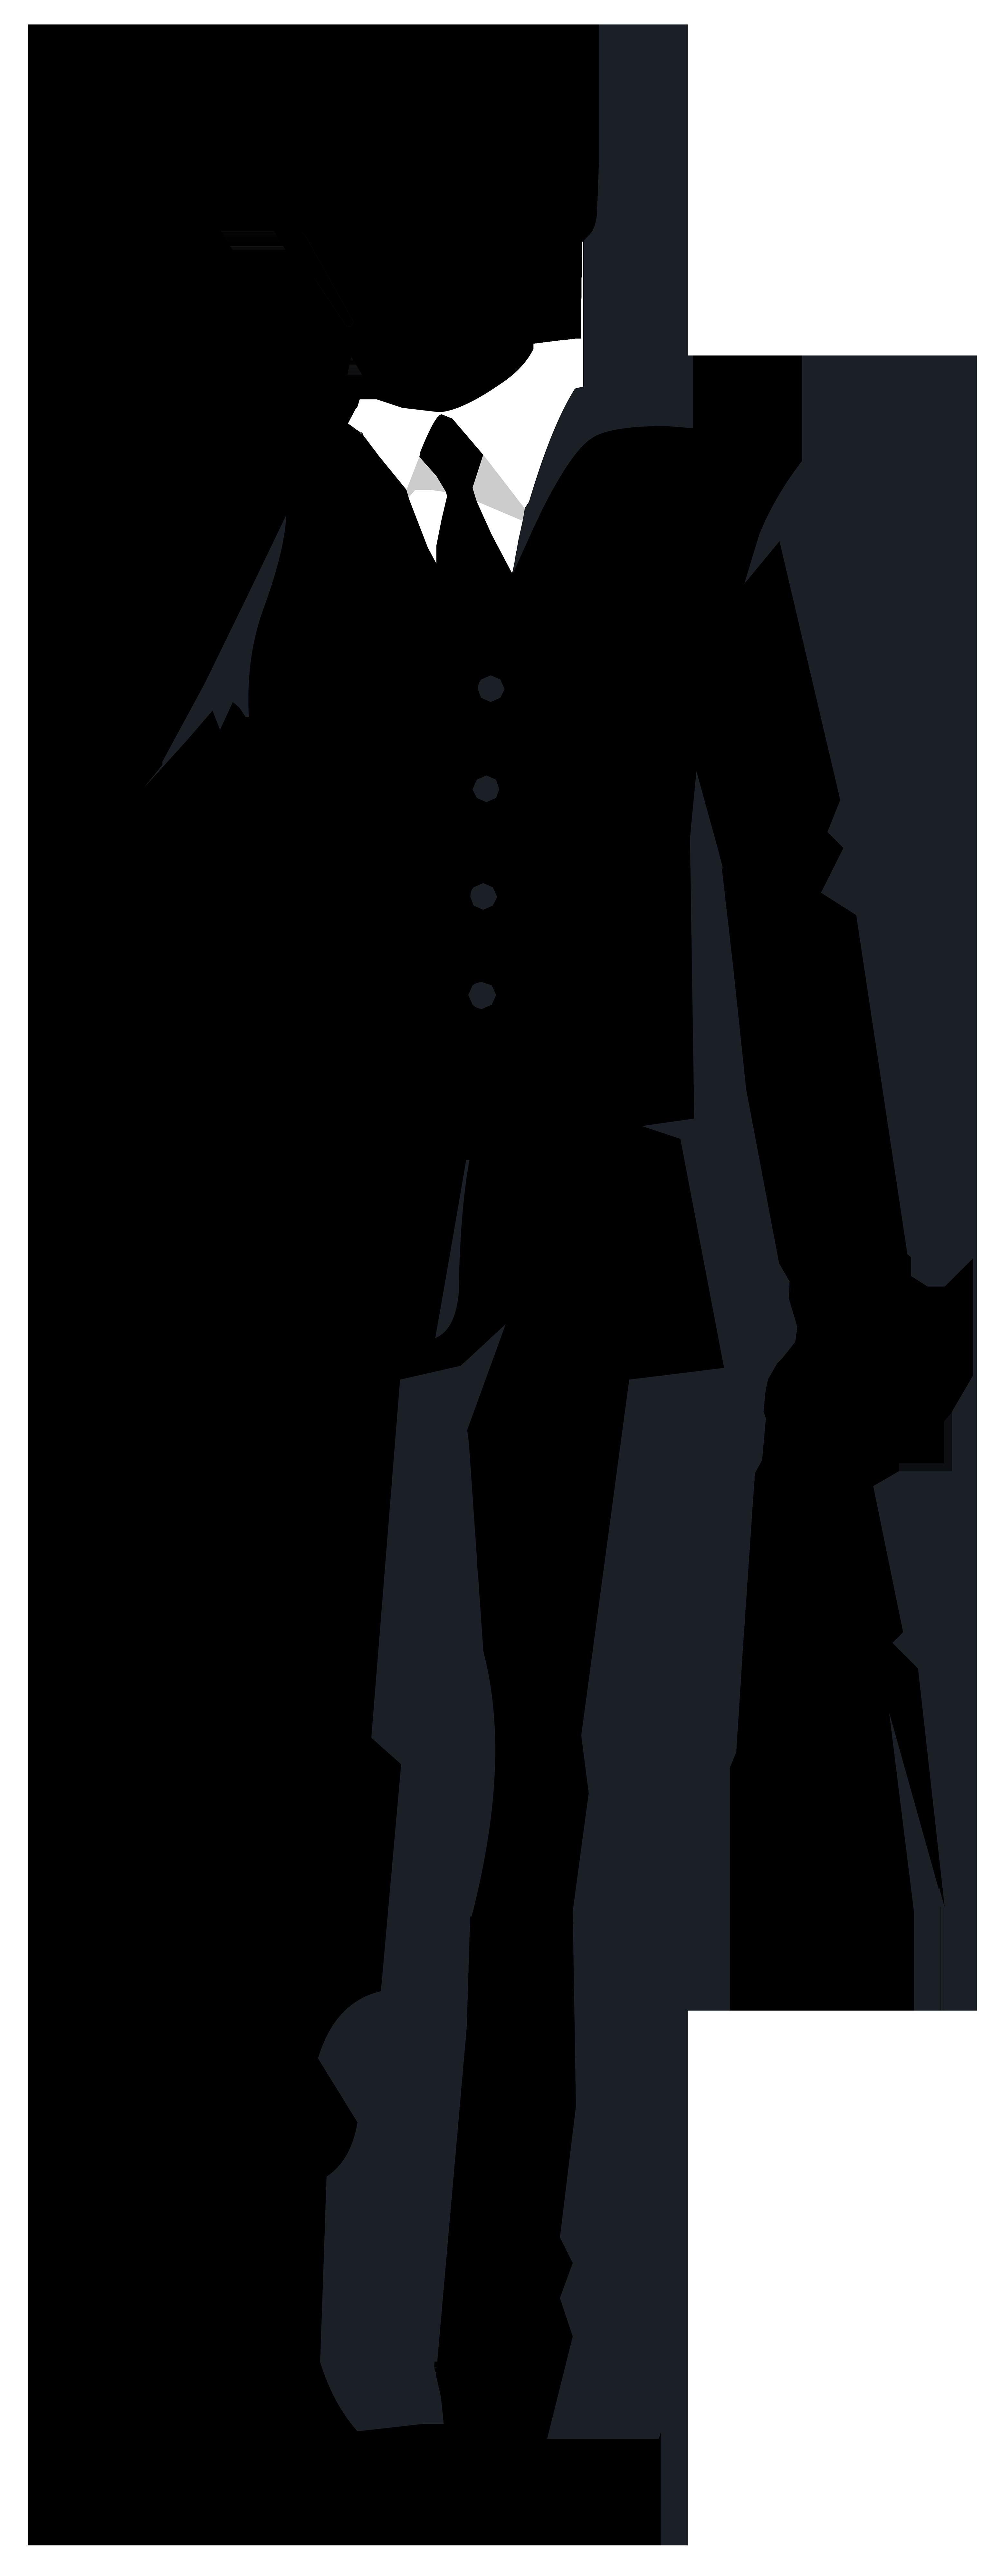 Businessman silhouette png transparent. Professional clipart buisness